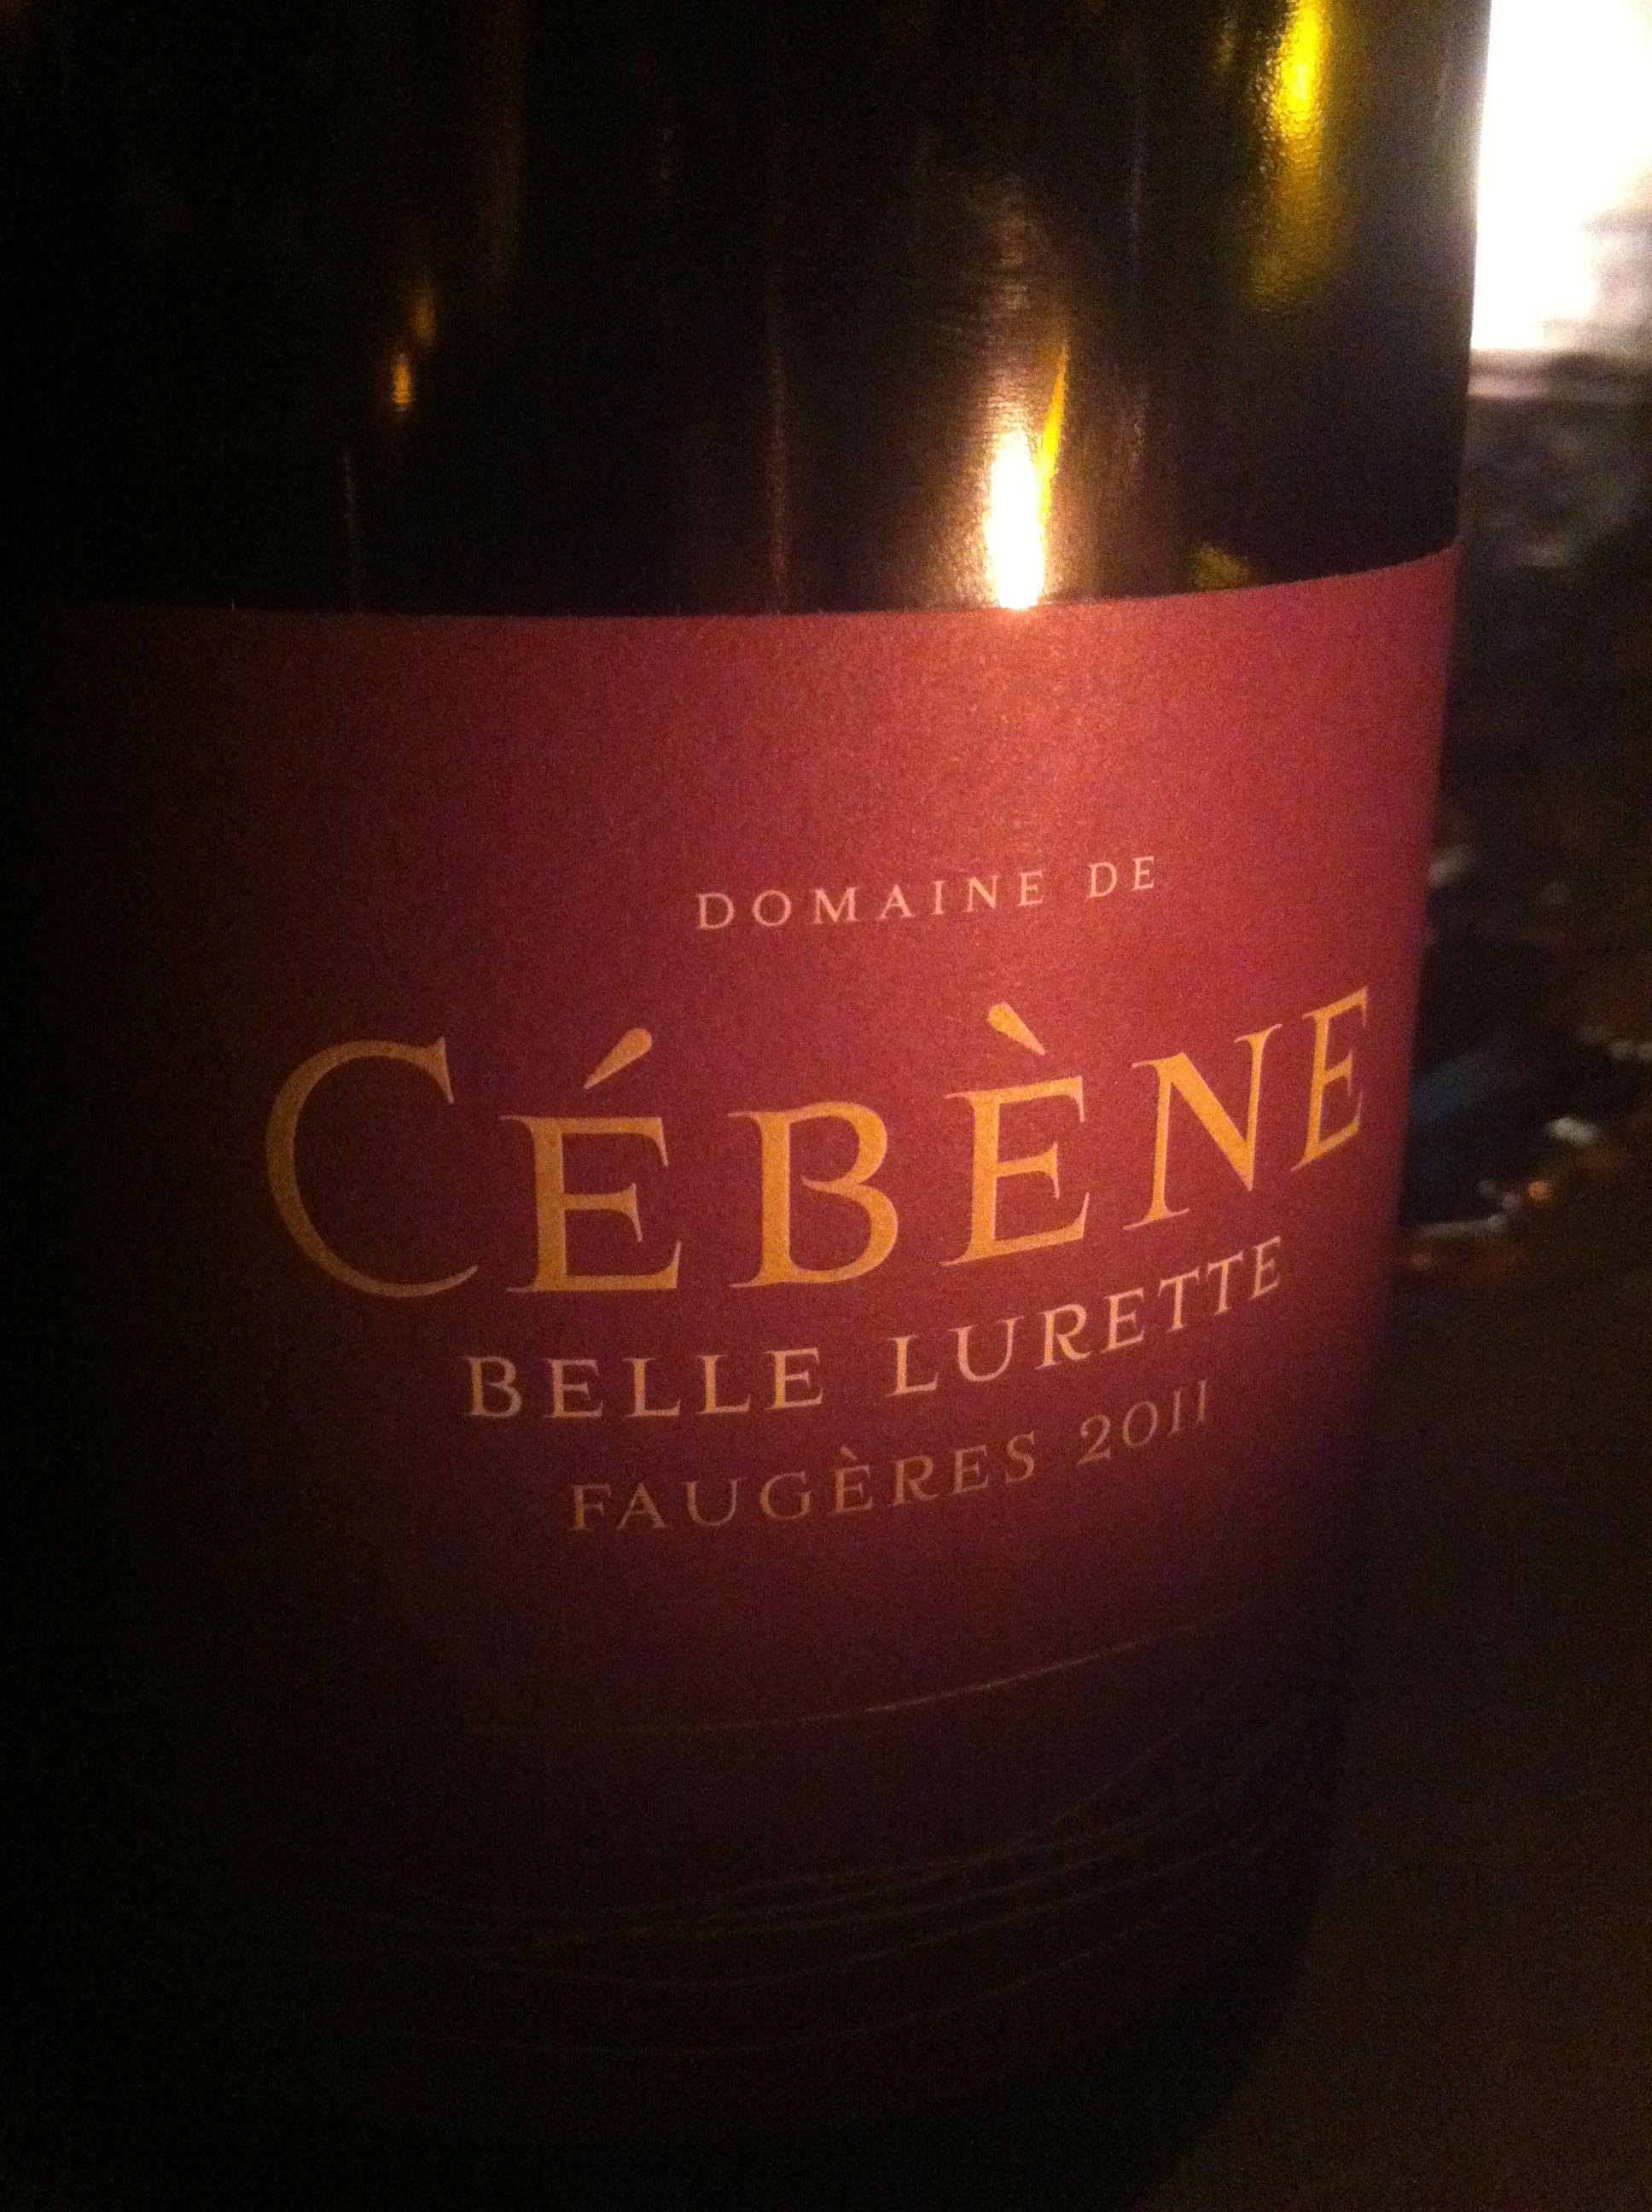 Domaine De Cebene 2011 Faugeres Belle Lurette Wine Label Wine Bottle Bottle